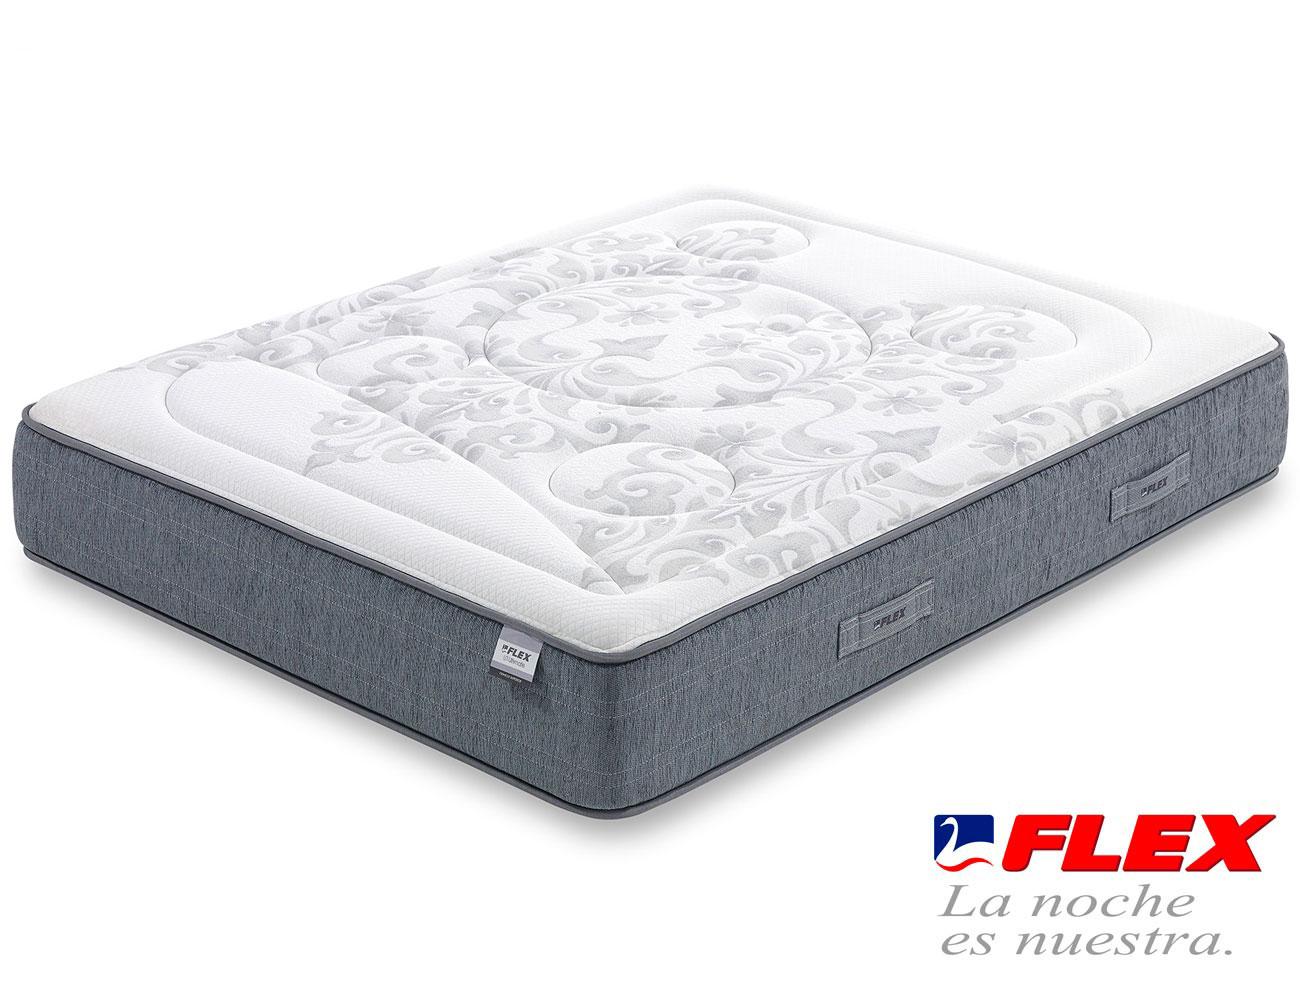 Colchon flex airvex viscoelastica gel garbi superior11